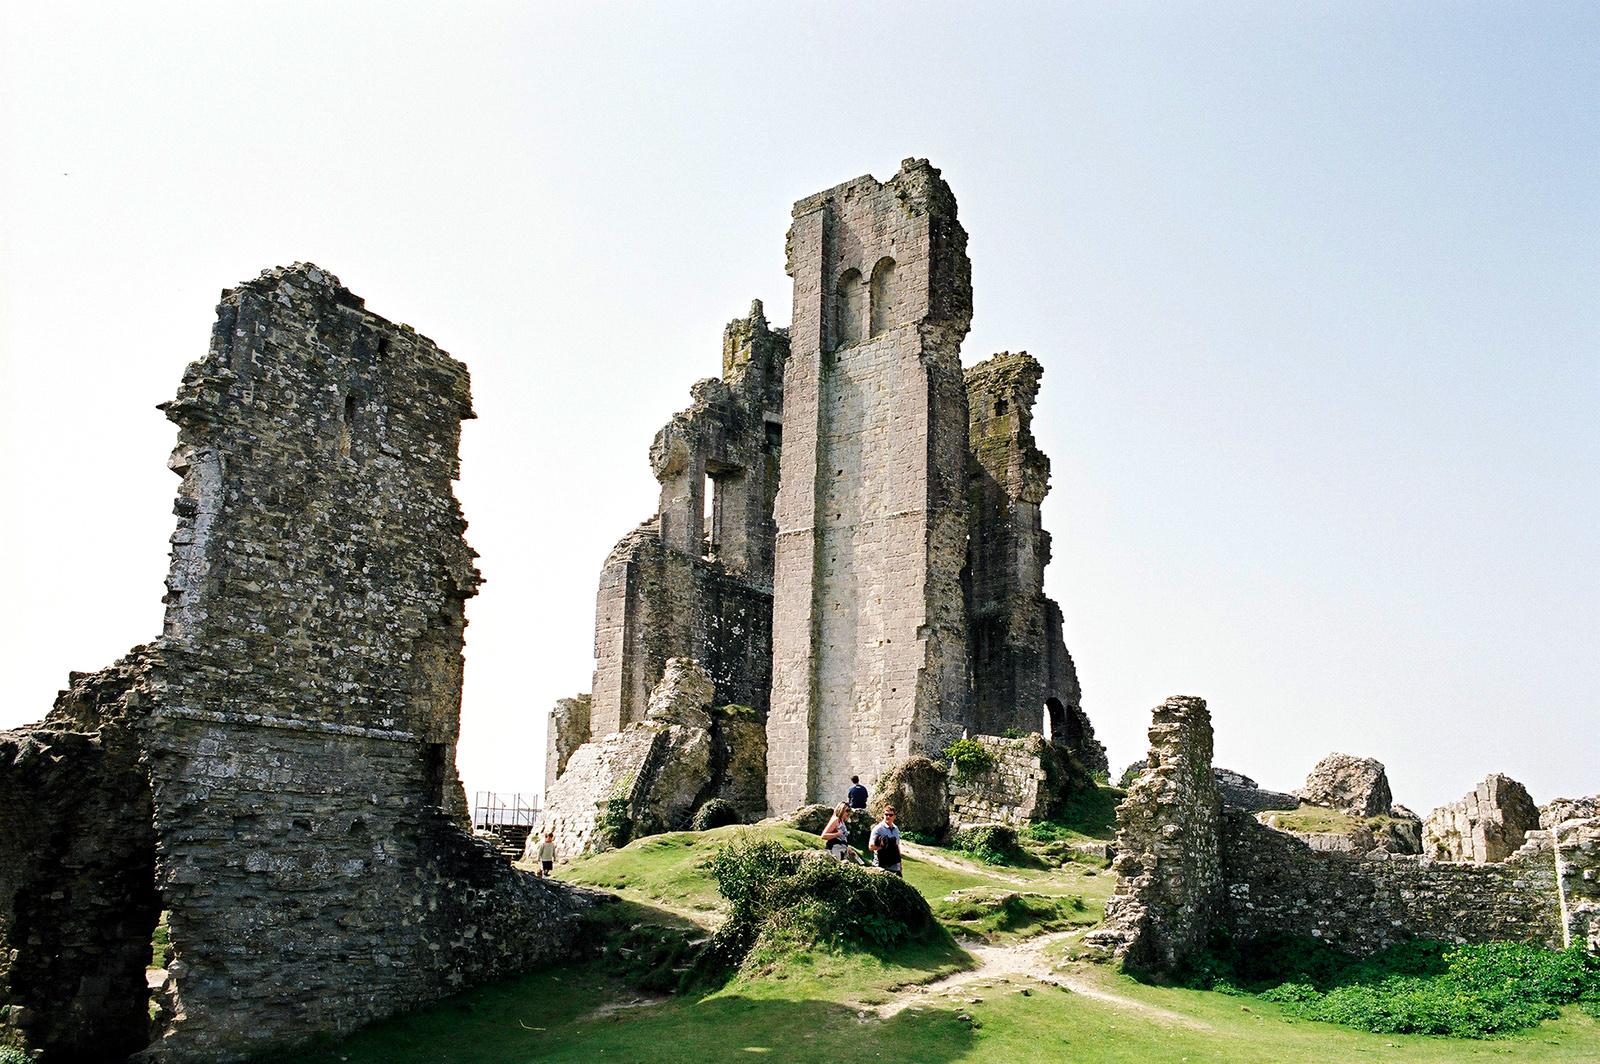 The ruins of Tintagel Castle, Cornwall UK © Tanya Clarke